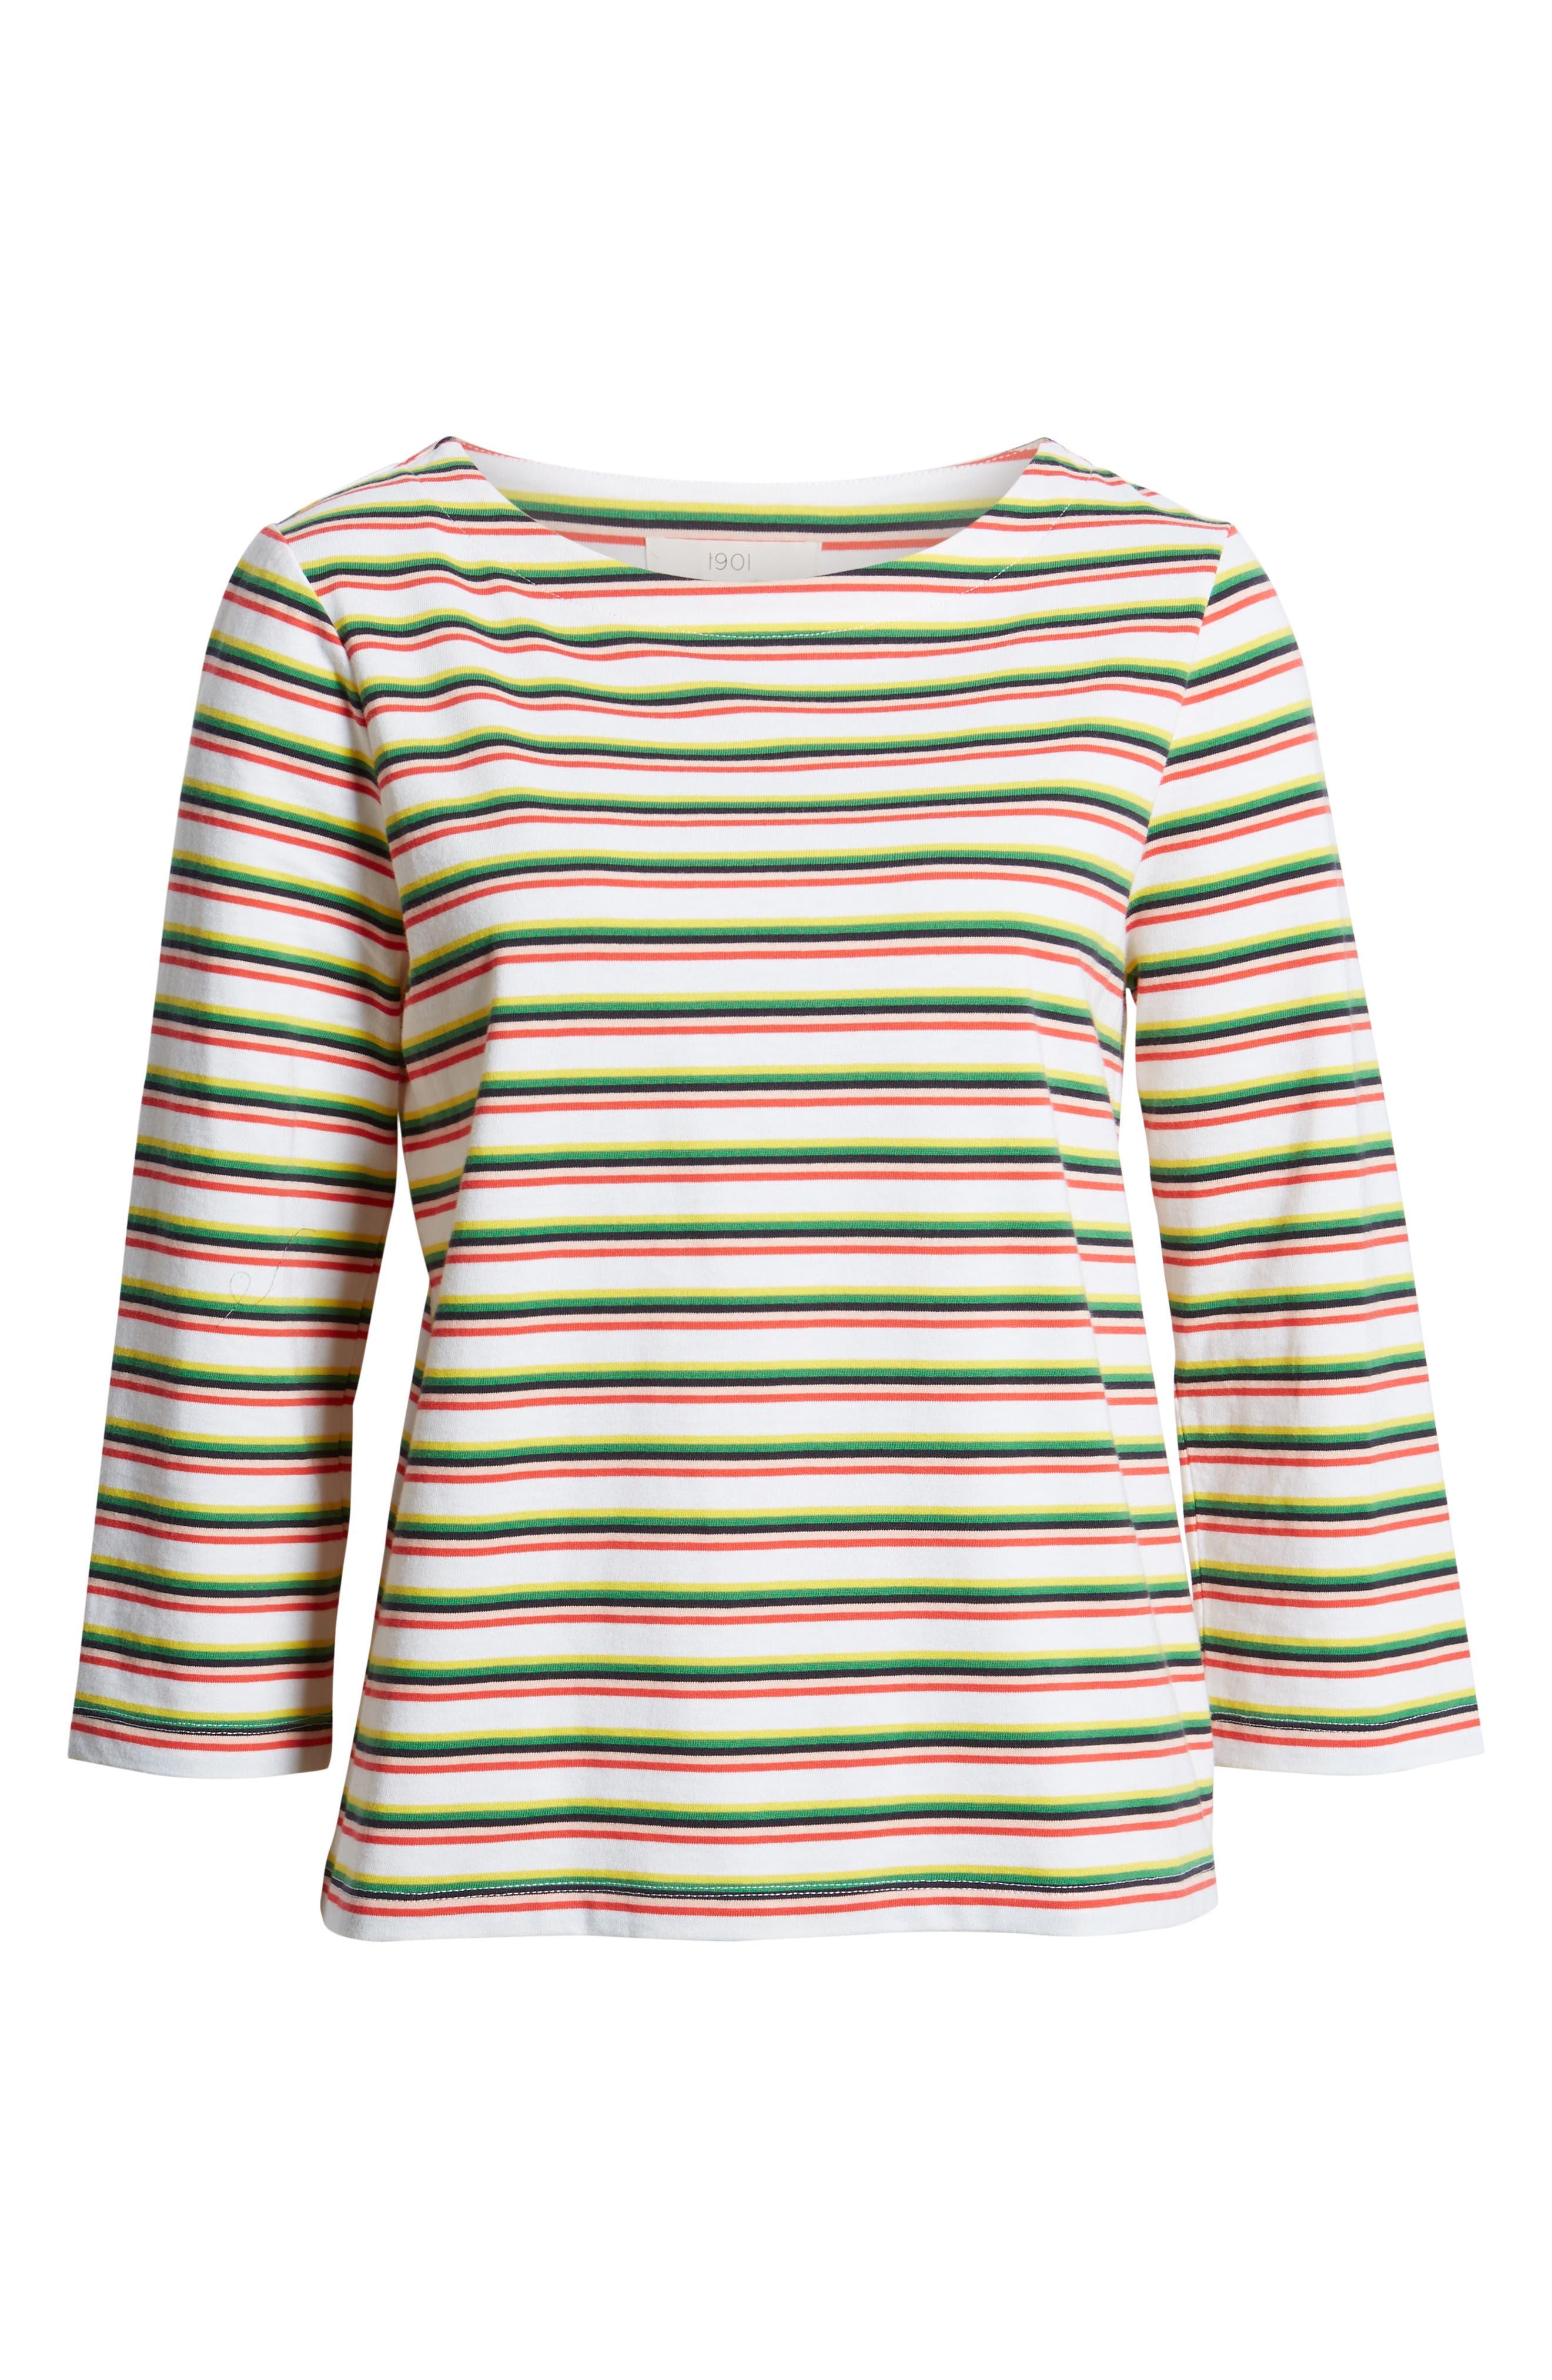 Stripe Top,                             Alternate thumbnail 6, color,                             WHITE MULTI PRIDE STRIPE